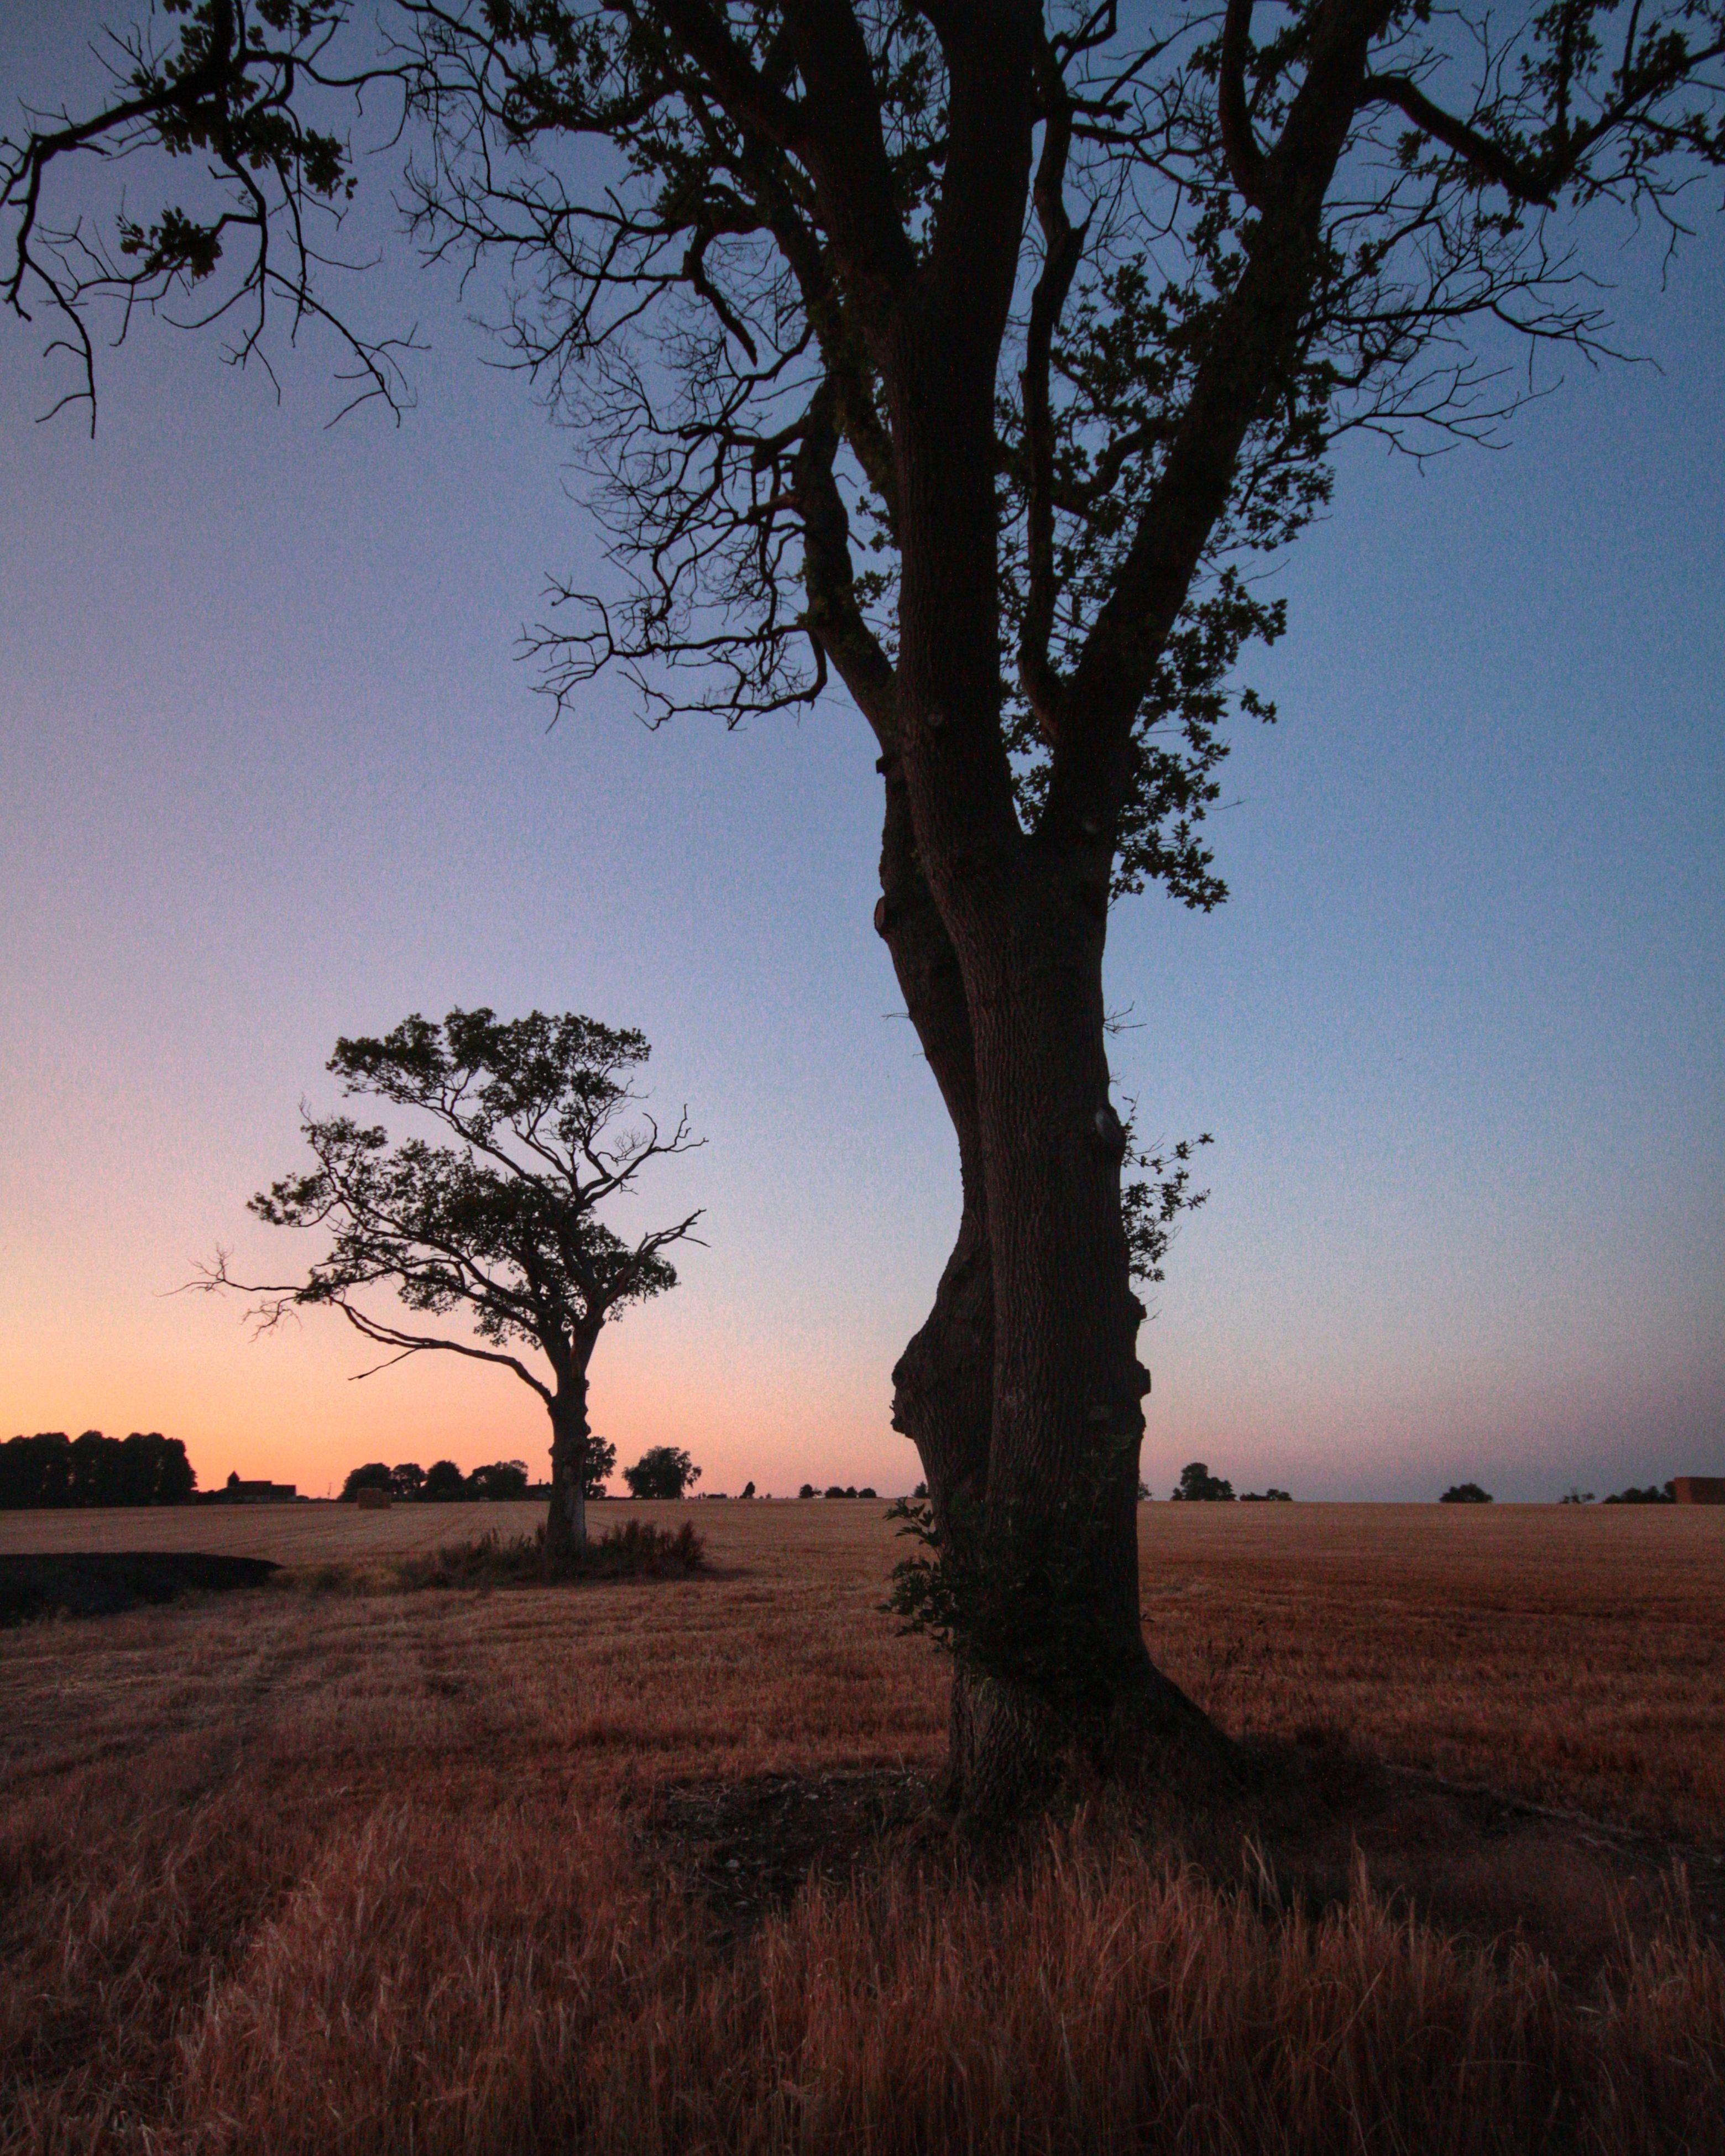 bare tree, tree, landscape, tranquility, field, tranquil scene, scenics, branch, nature, clear sky, beauty in nature, grass, tree trunk, rural scene, sky, non-urban scene, solitude, horizon over land, silhouette, growth